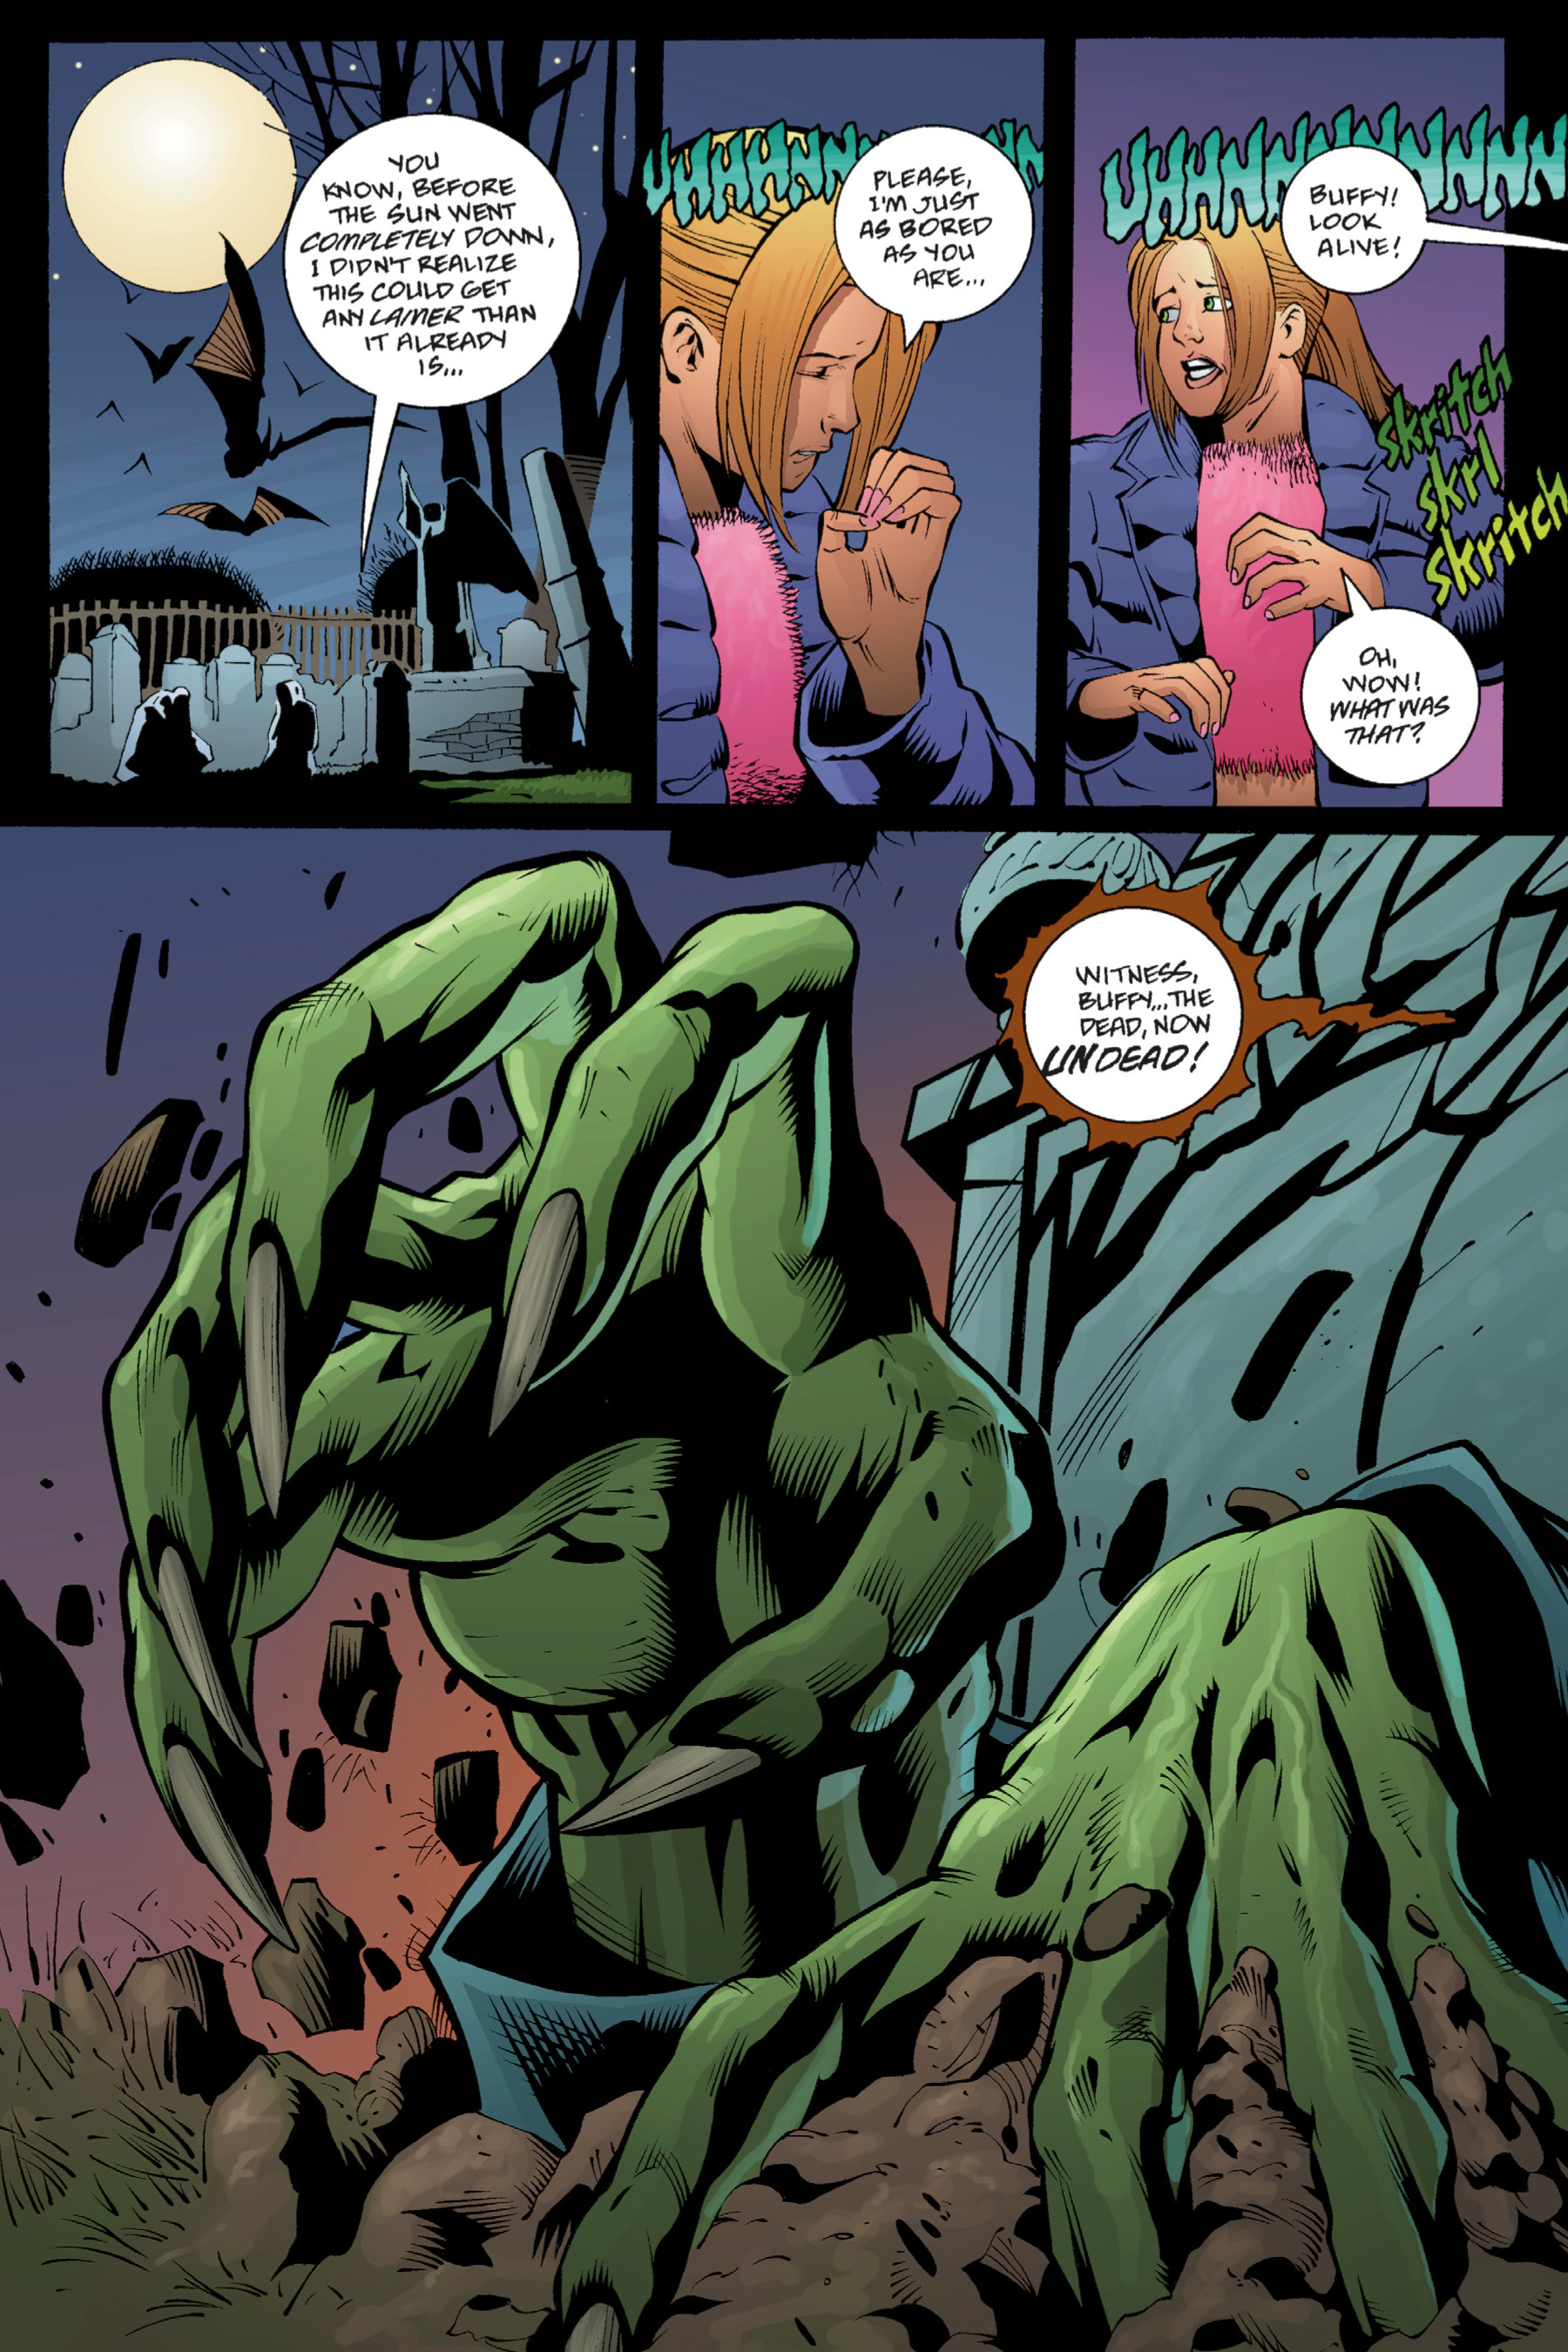 Read online Buffy the Vampire Slayer: Omnibus comic -  Issue # TPB 1 - 55